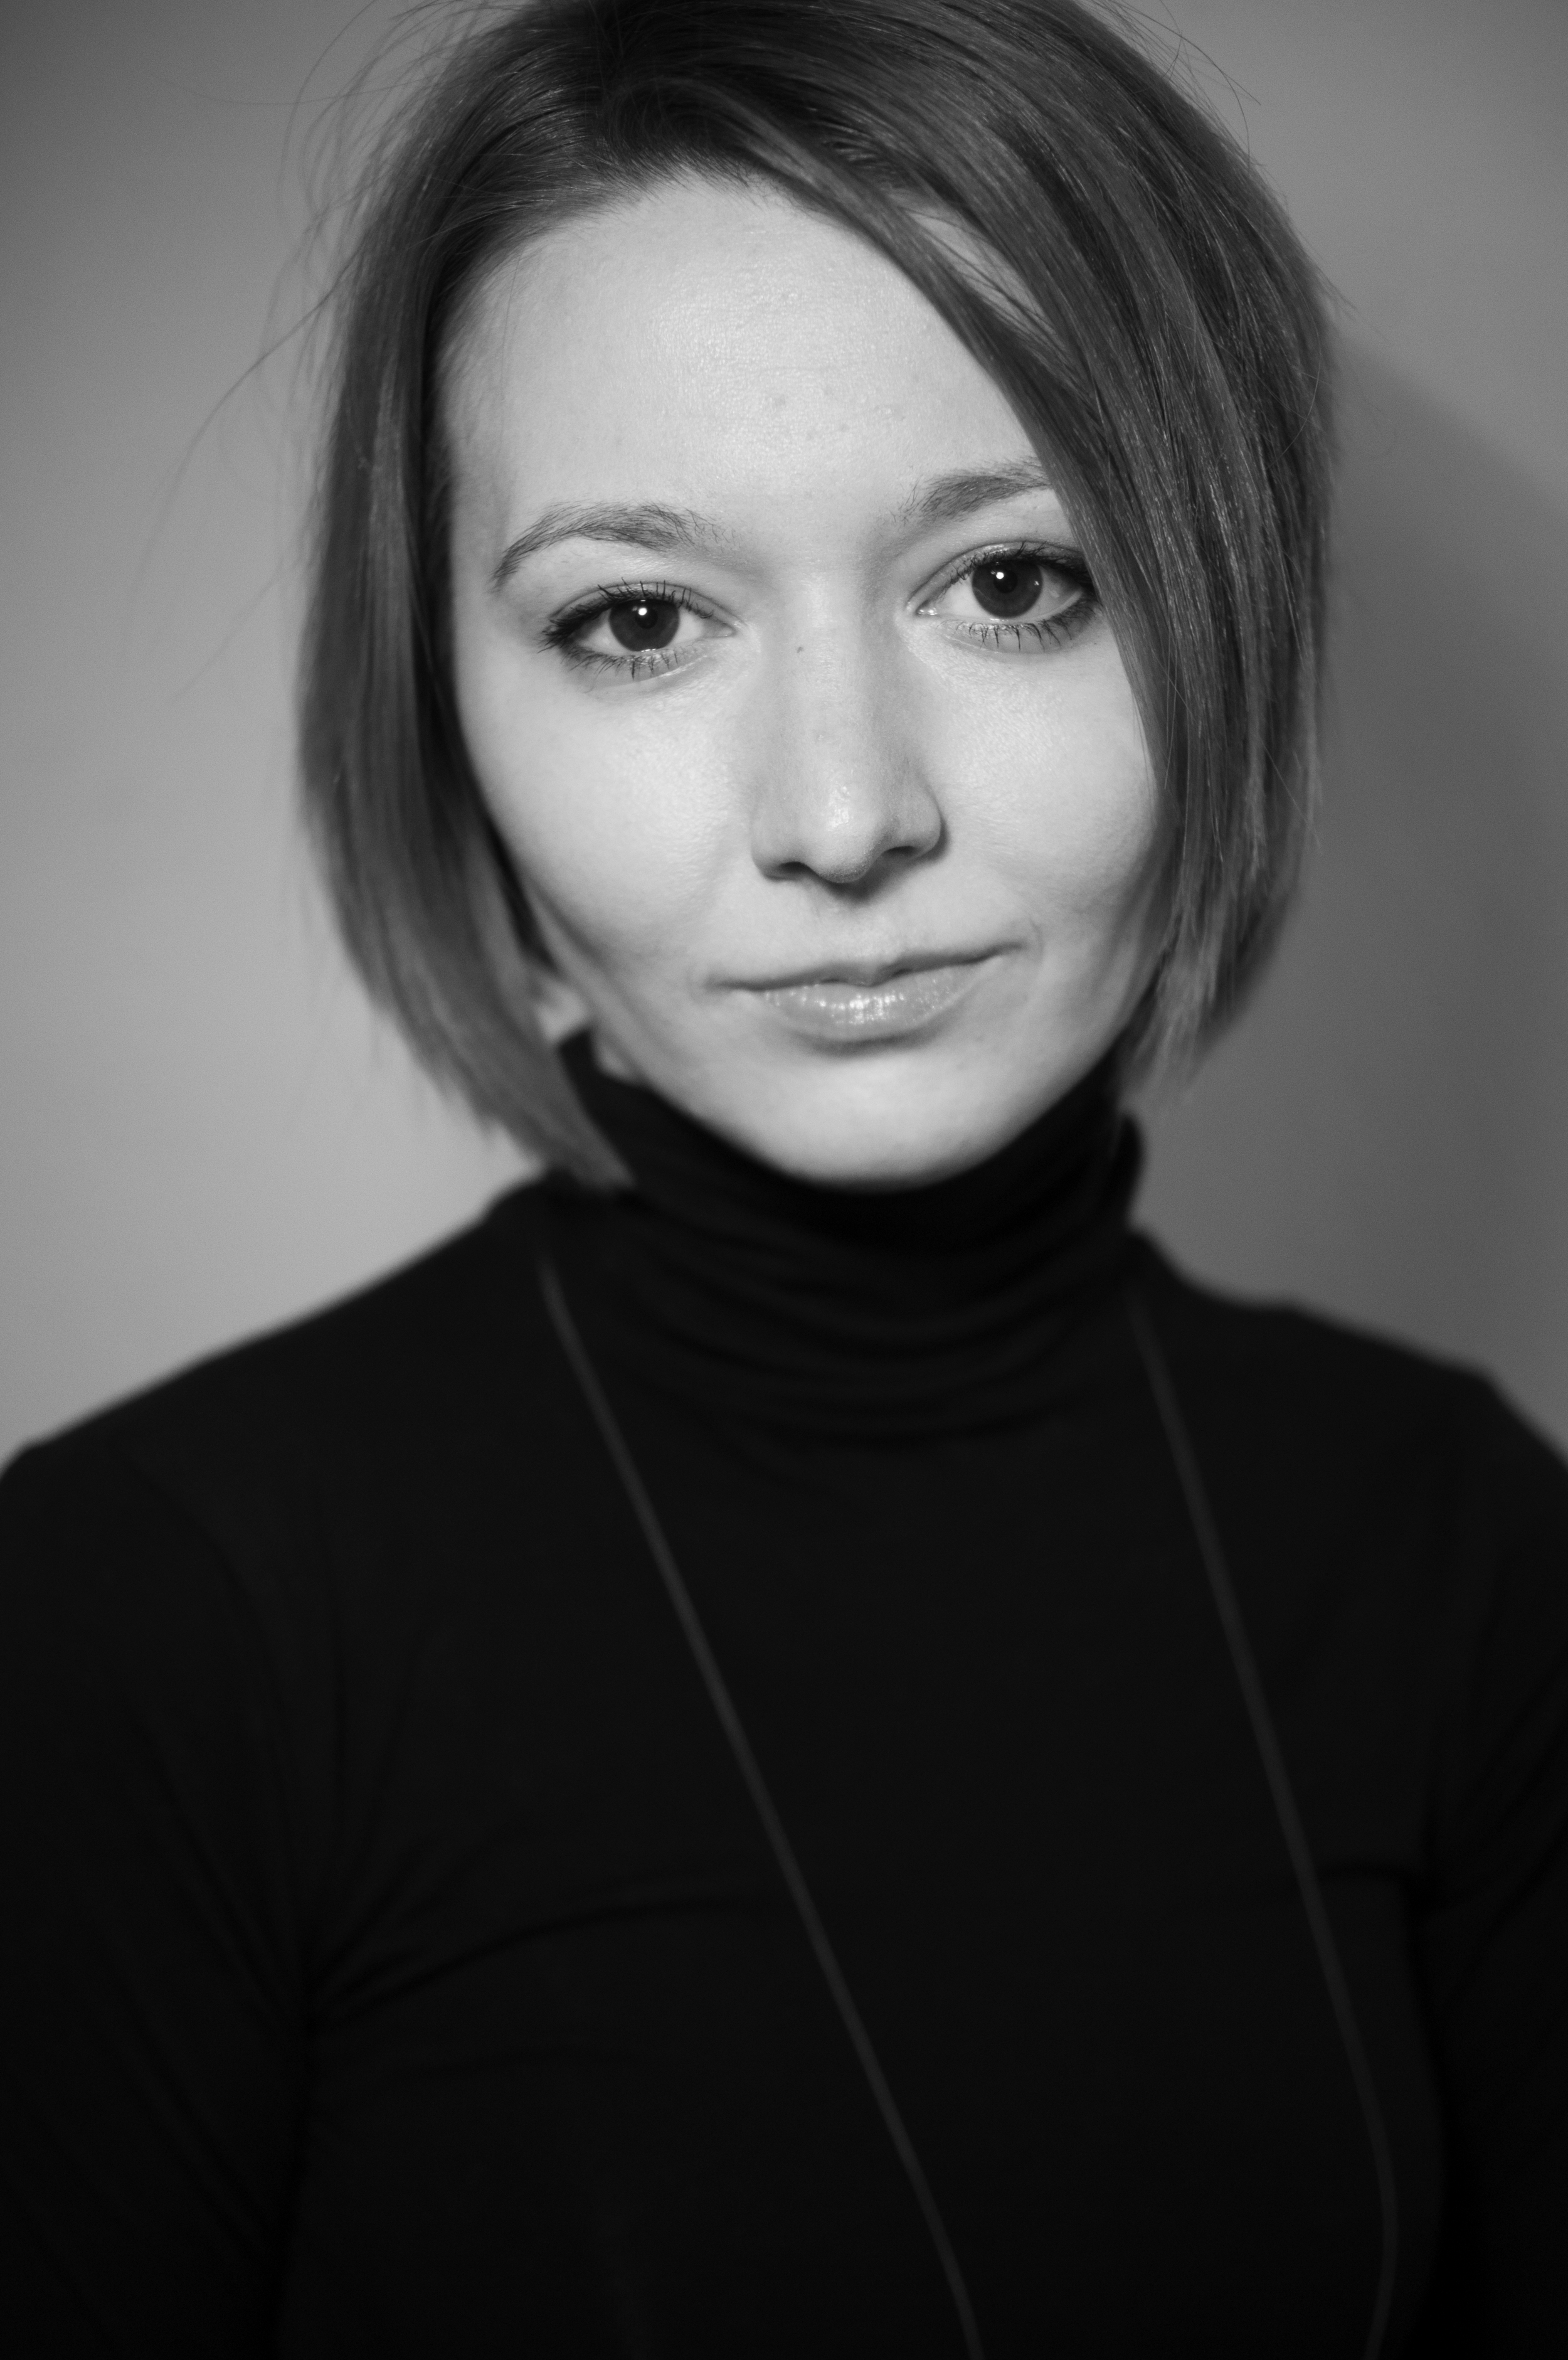 Viktoria Szabo